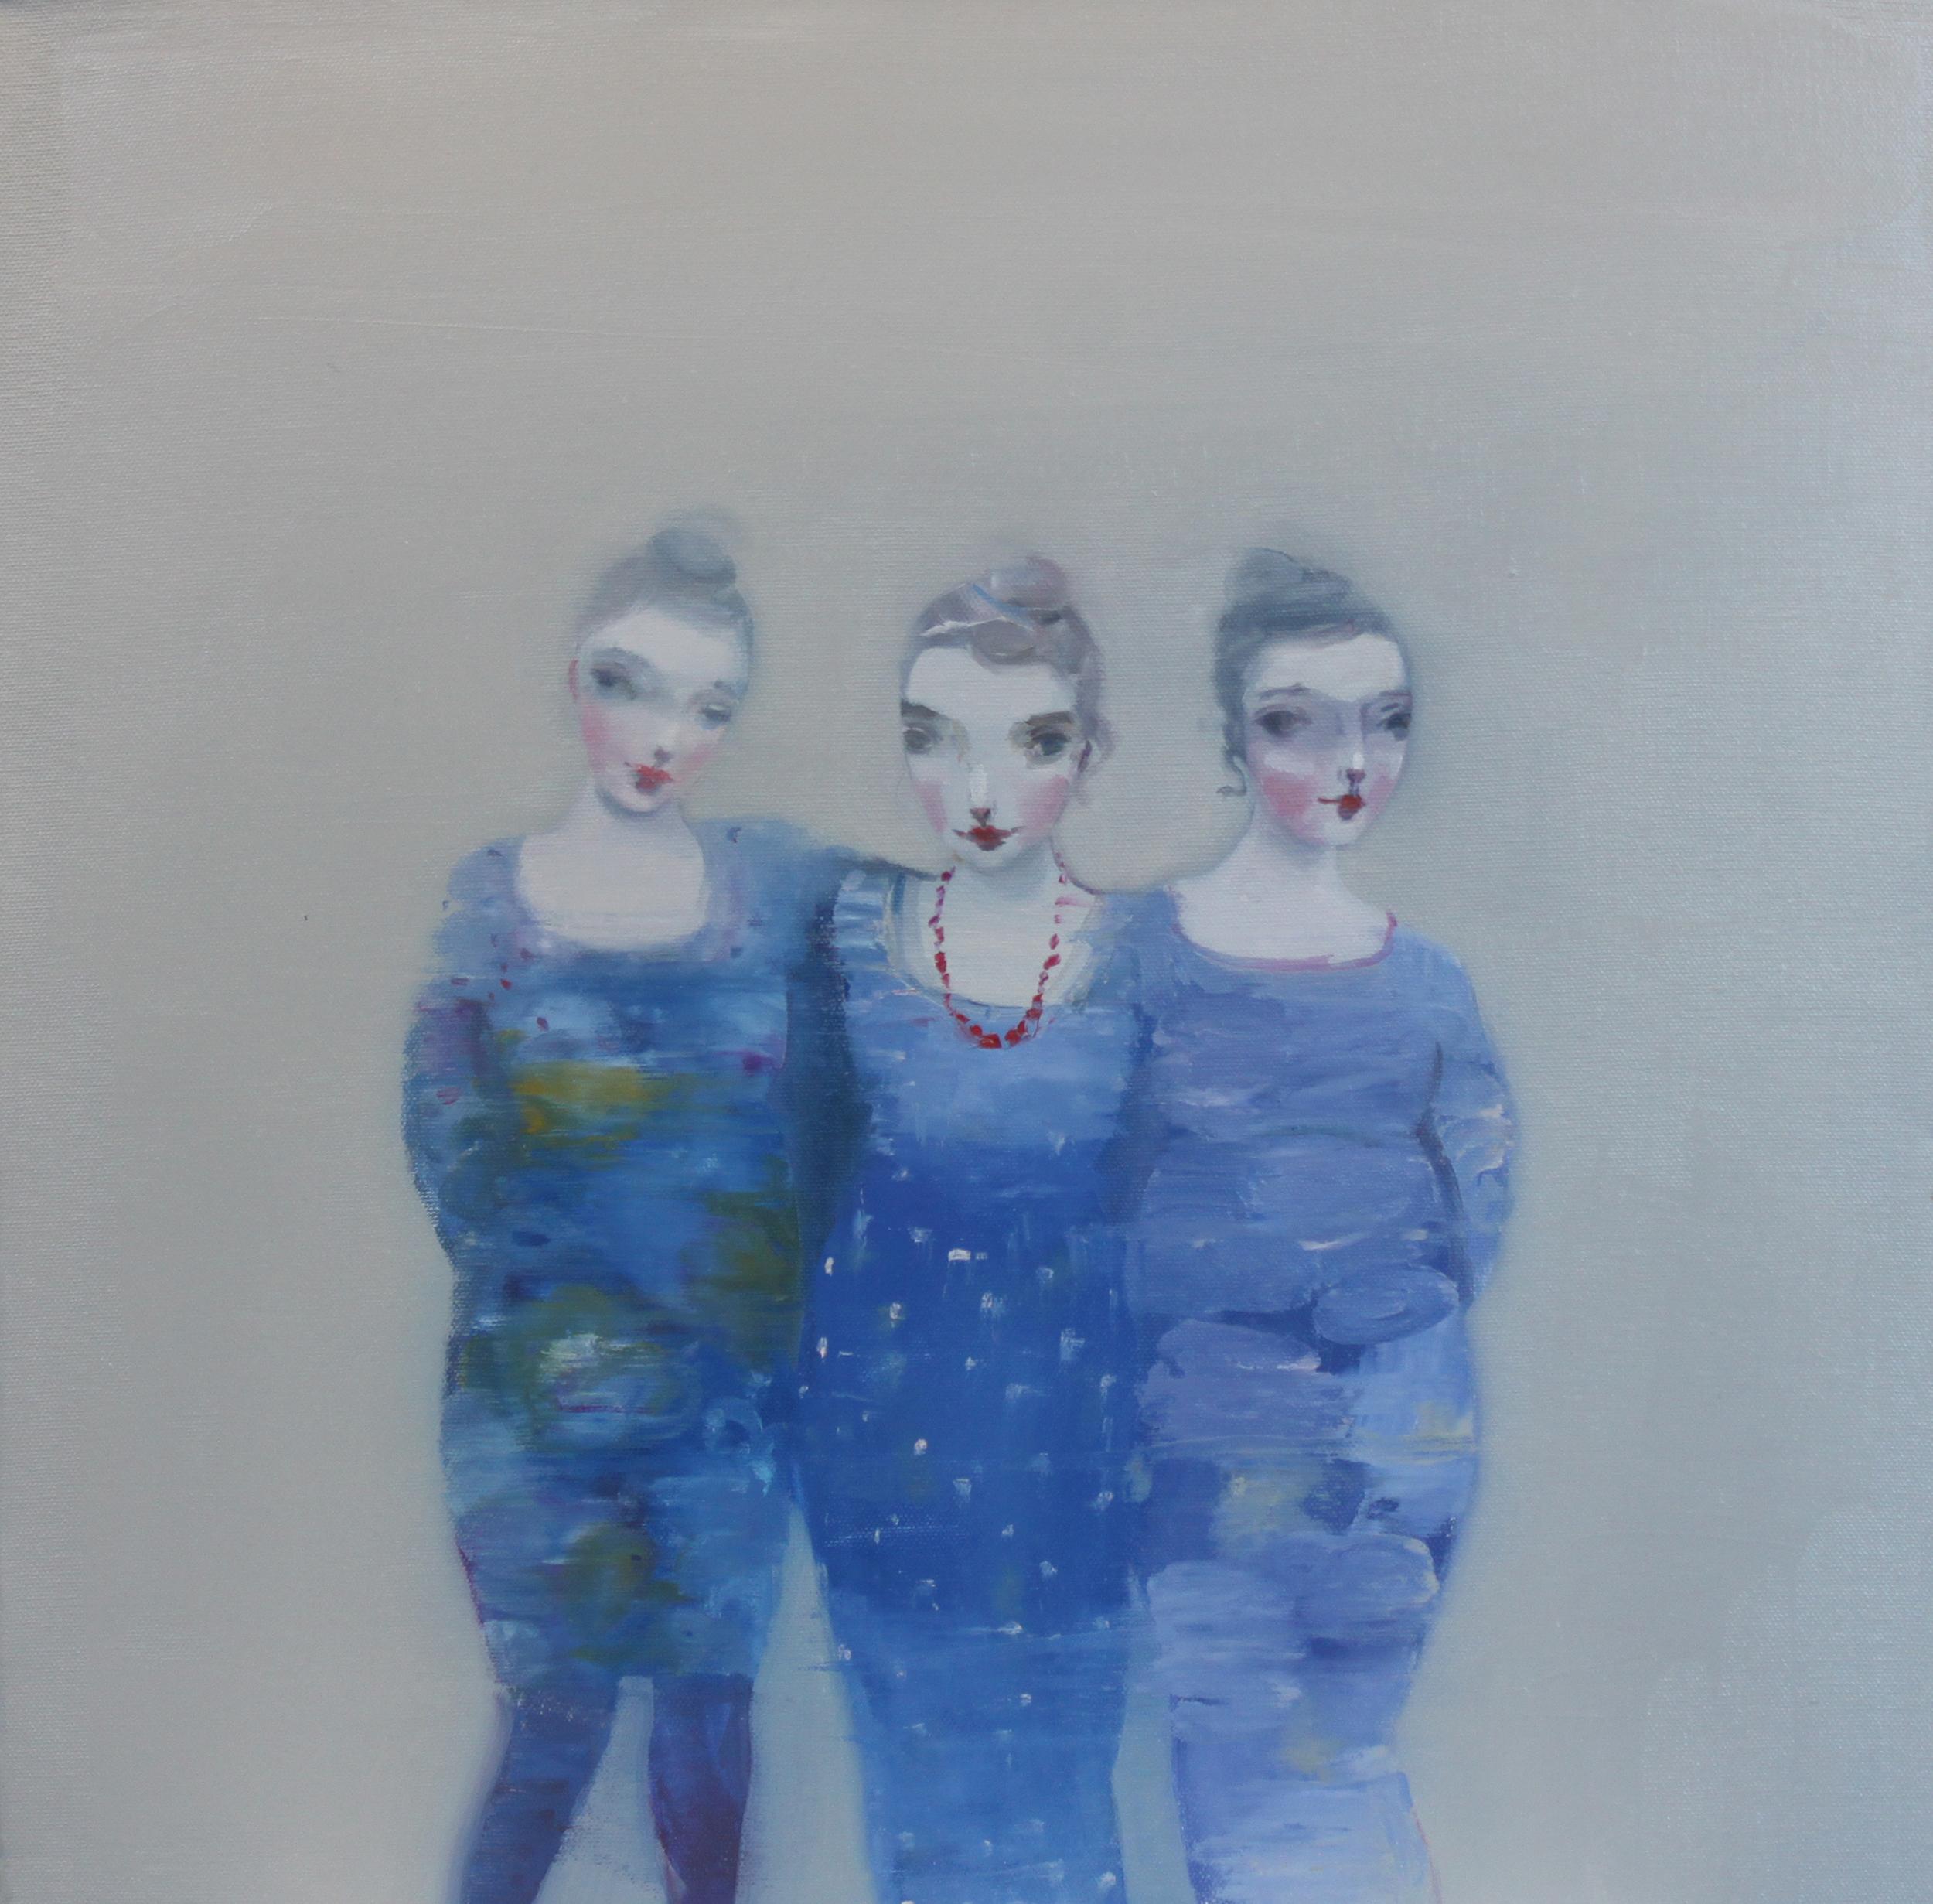 K r i s t i n V e s t g a r d  We Can Help 50 x 50 cm oil on canvas £ 2300